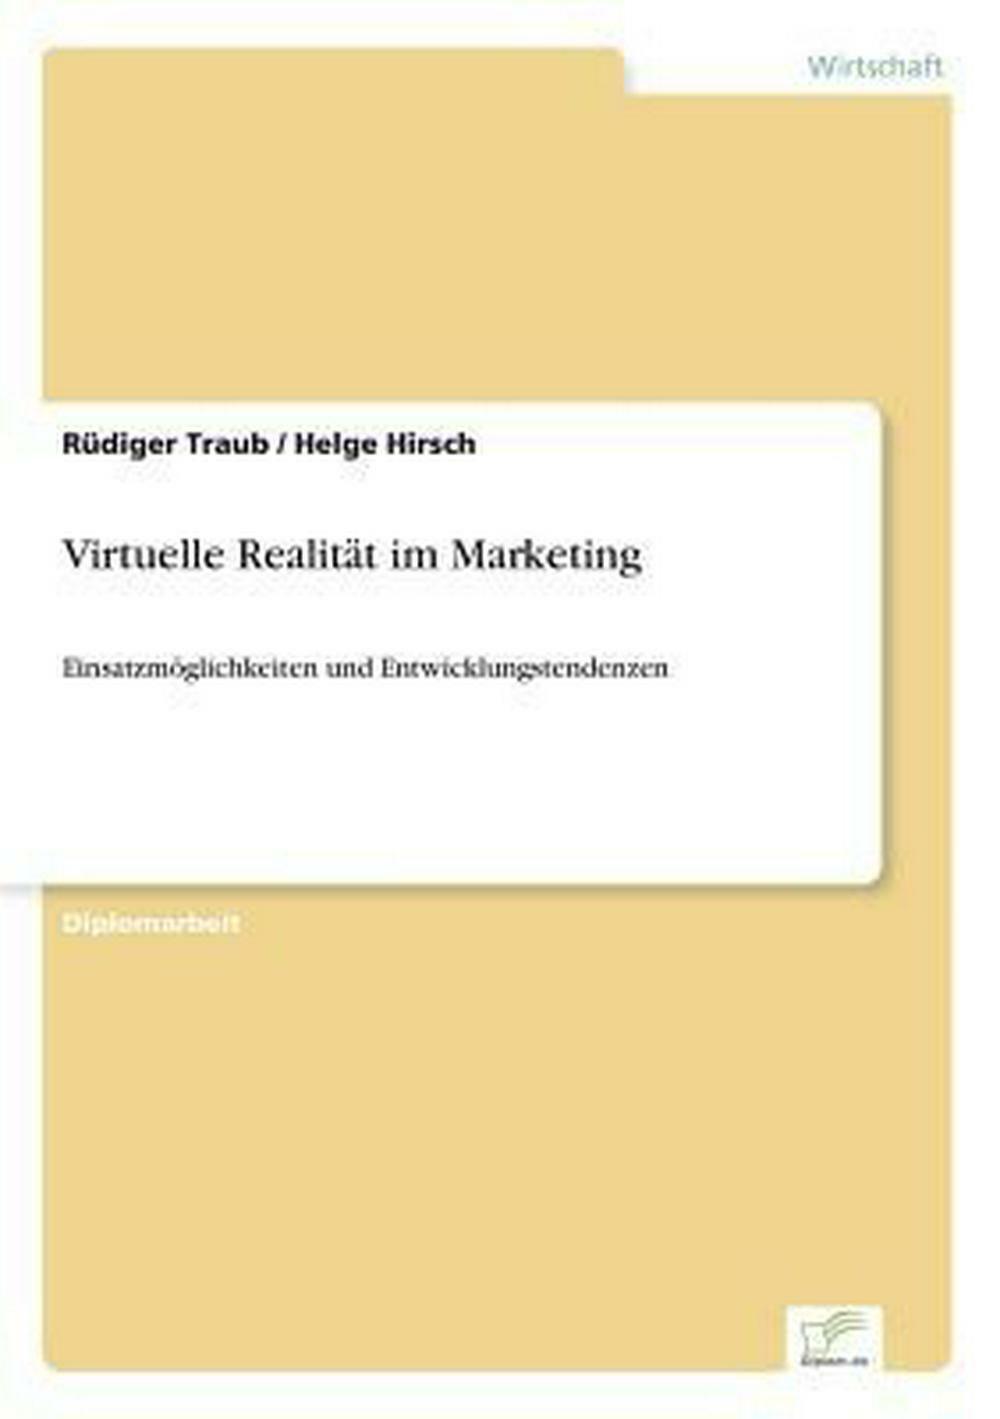 Virtuelle Realitat Im Marketing by Rudiger Traub (German) Paperback Book Free Sh